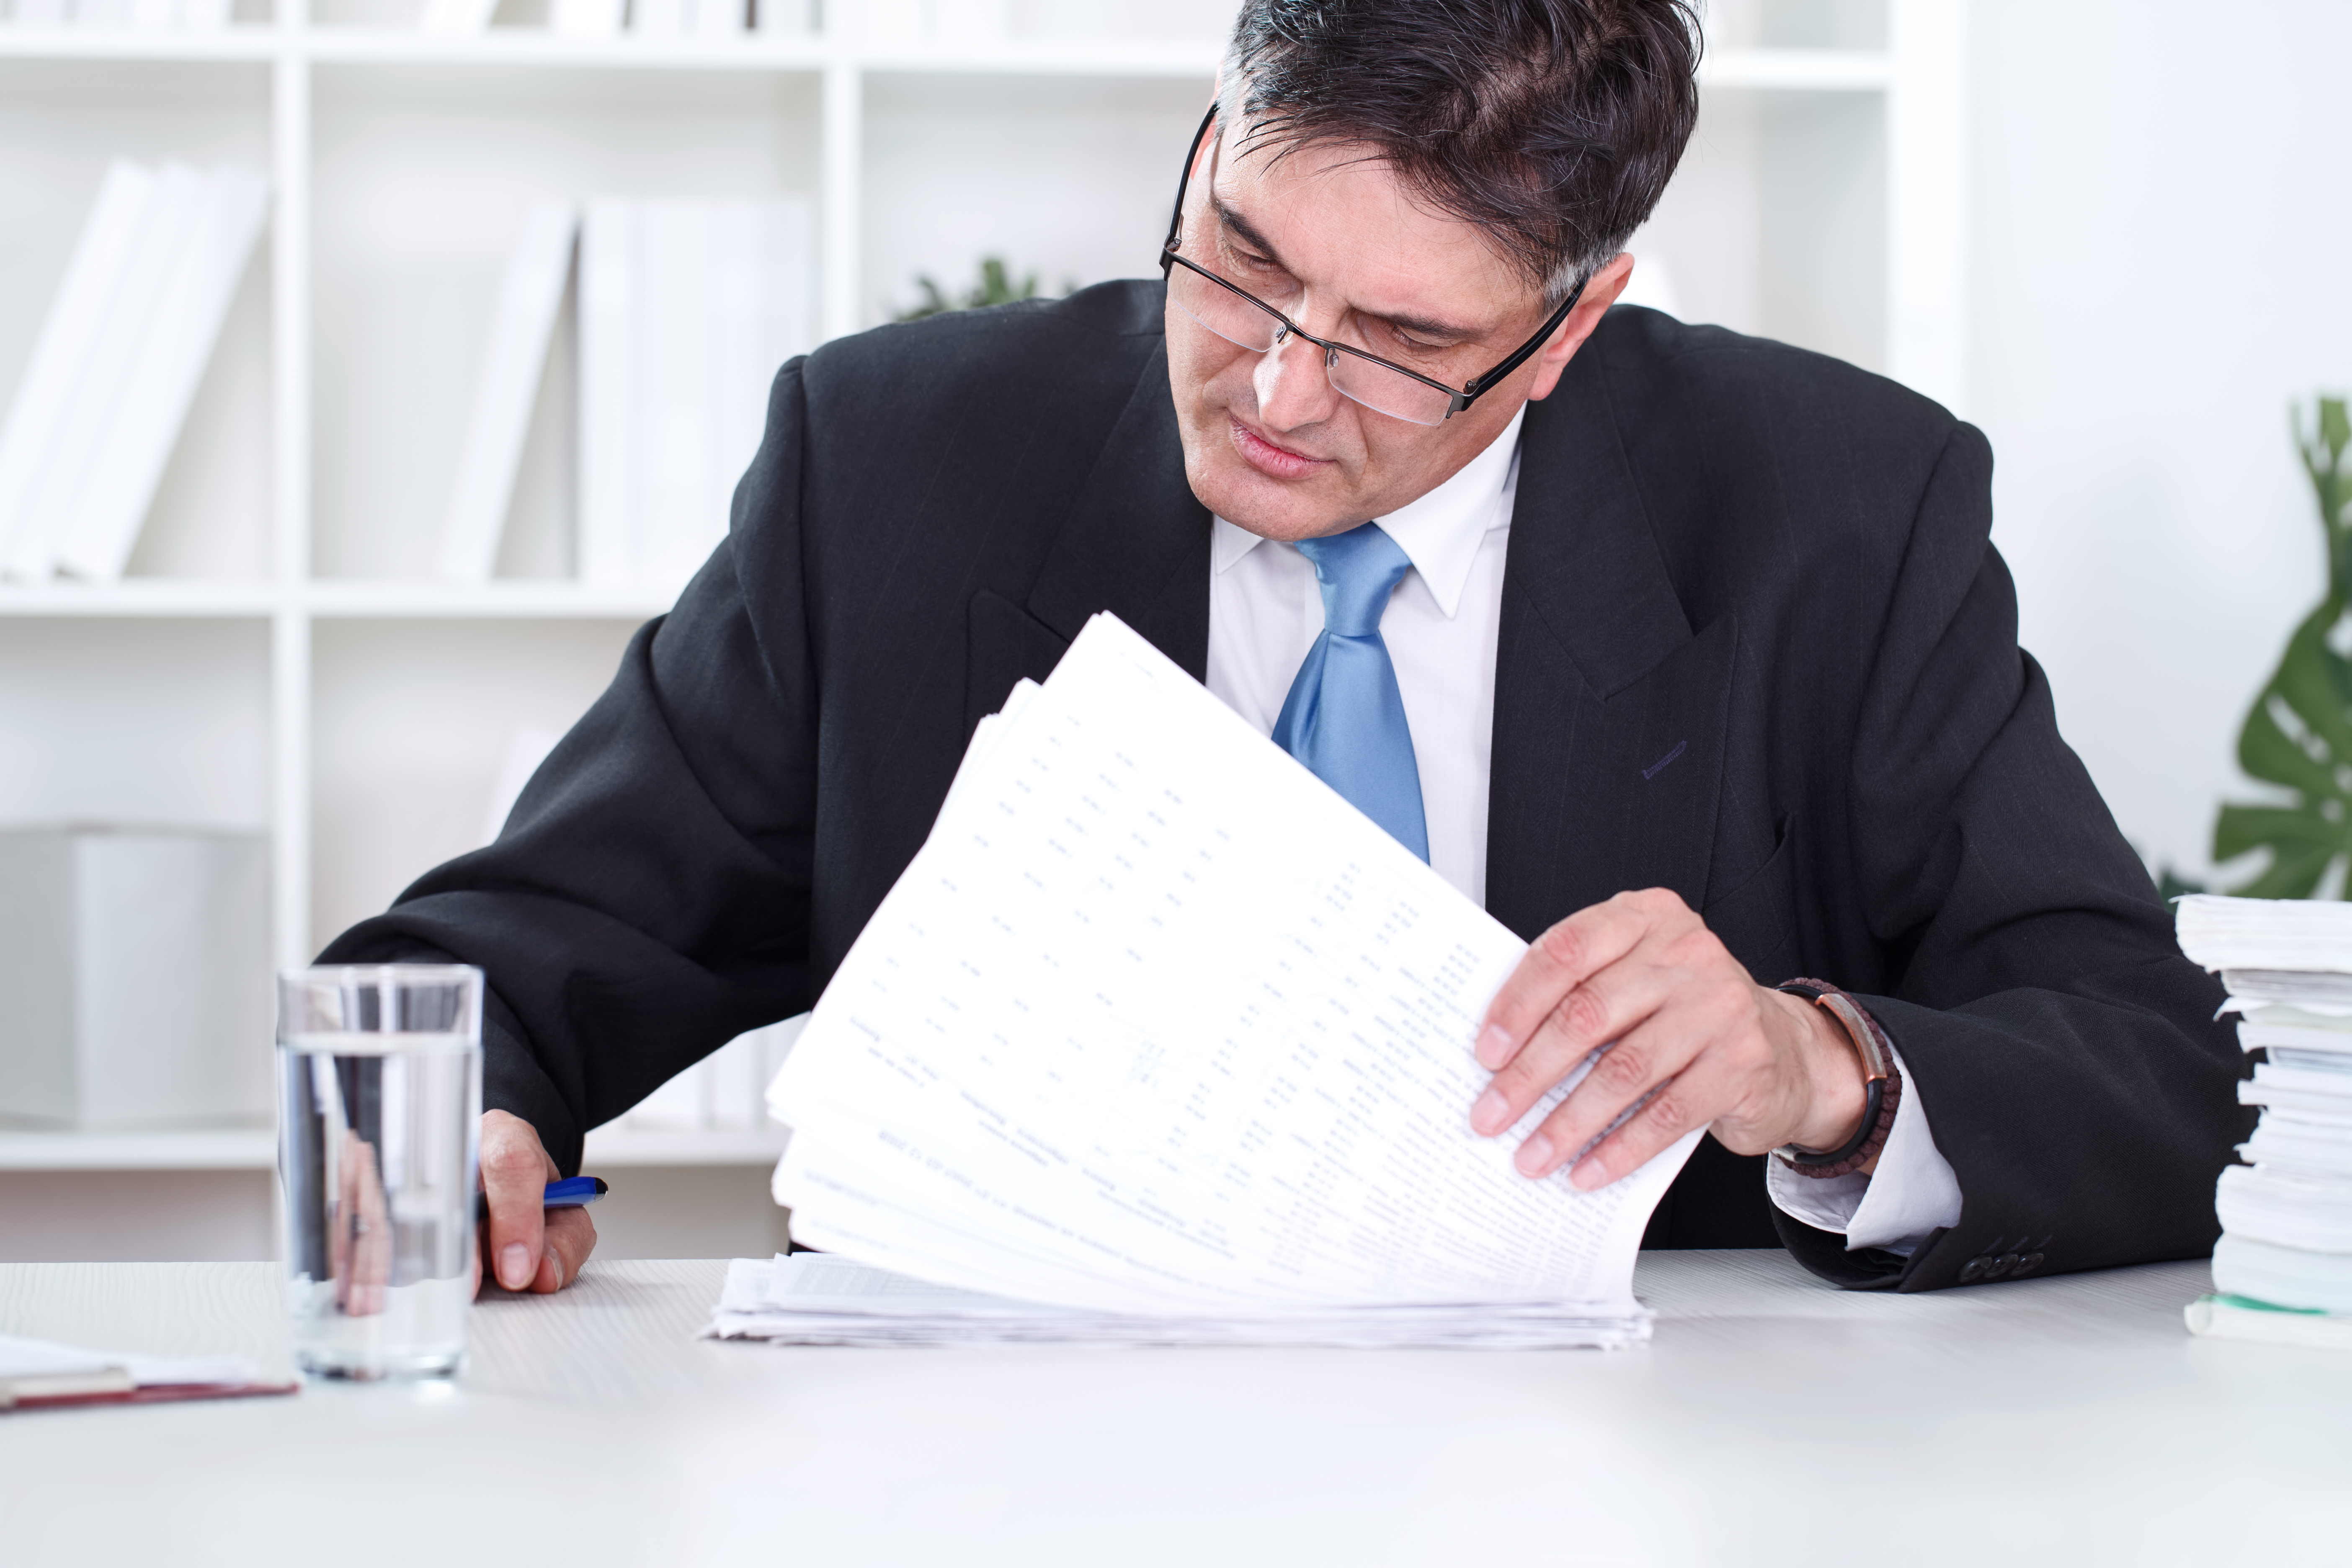 paperwork image 2